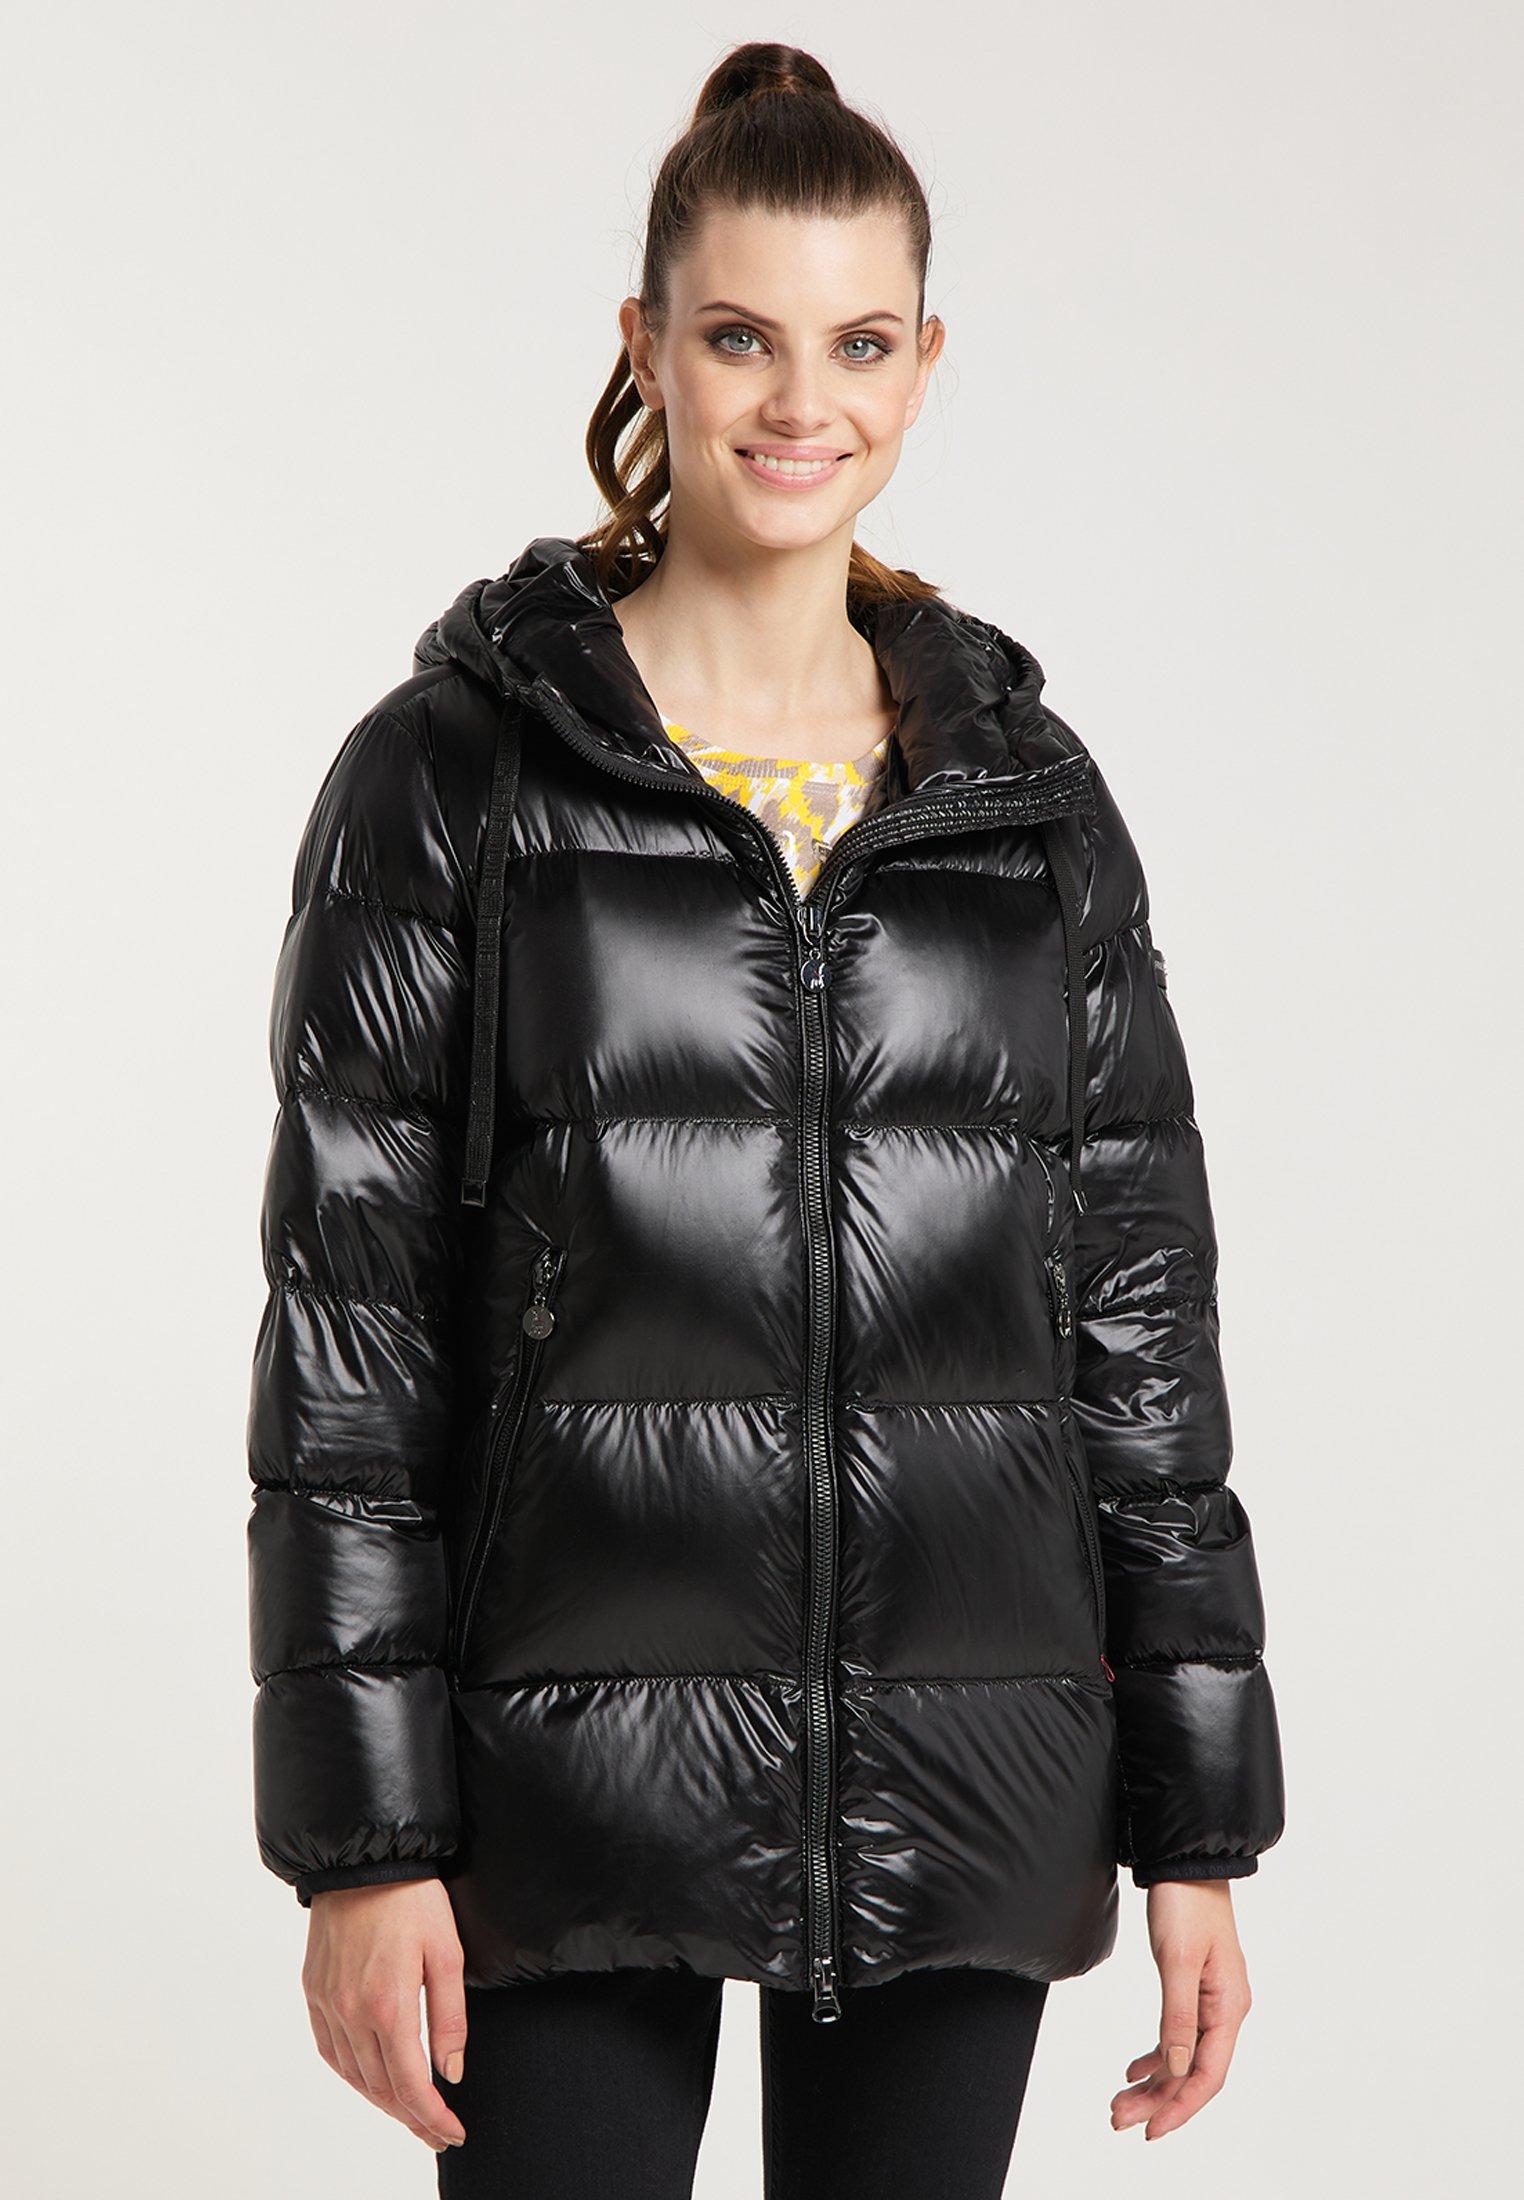 Women DAUNENJACKE JAVA MIT GLÄNZENDEM OBERSTOFF - Down coat